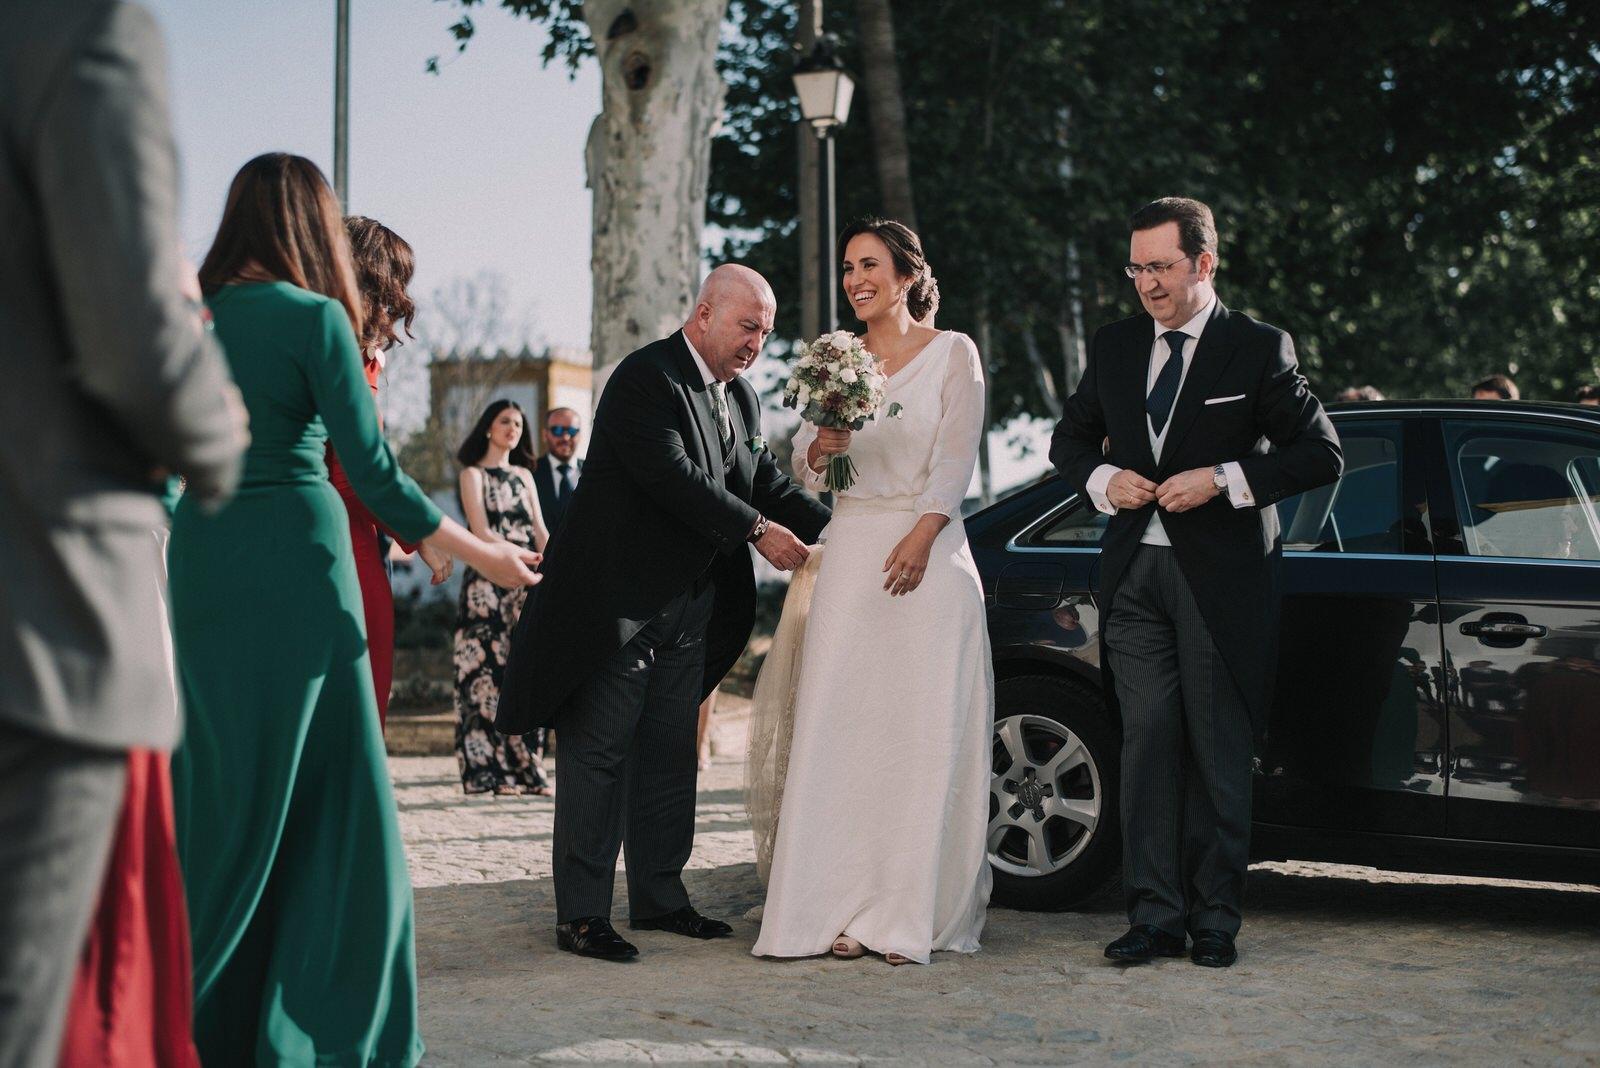 fotografo de bodas sevilla - fotografo boda - fotografía sevilla - Andrés AmarilloAAA_4669- tele- fine.JPG